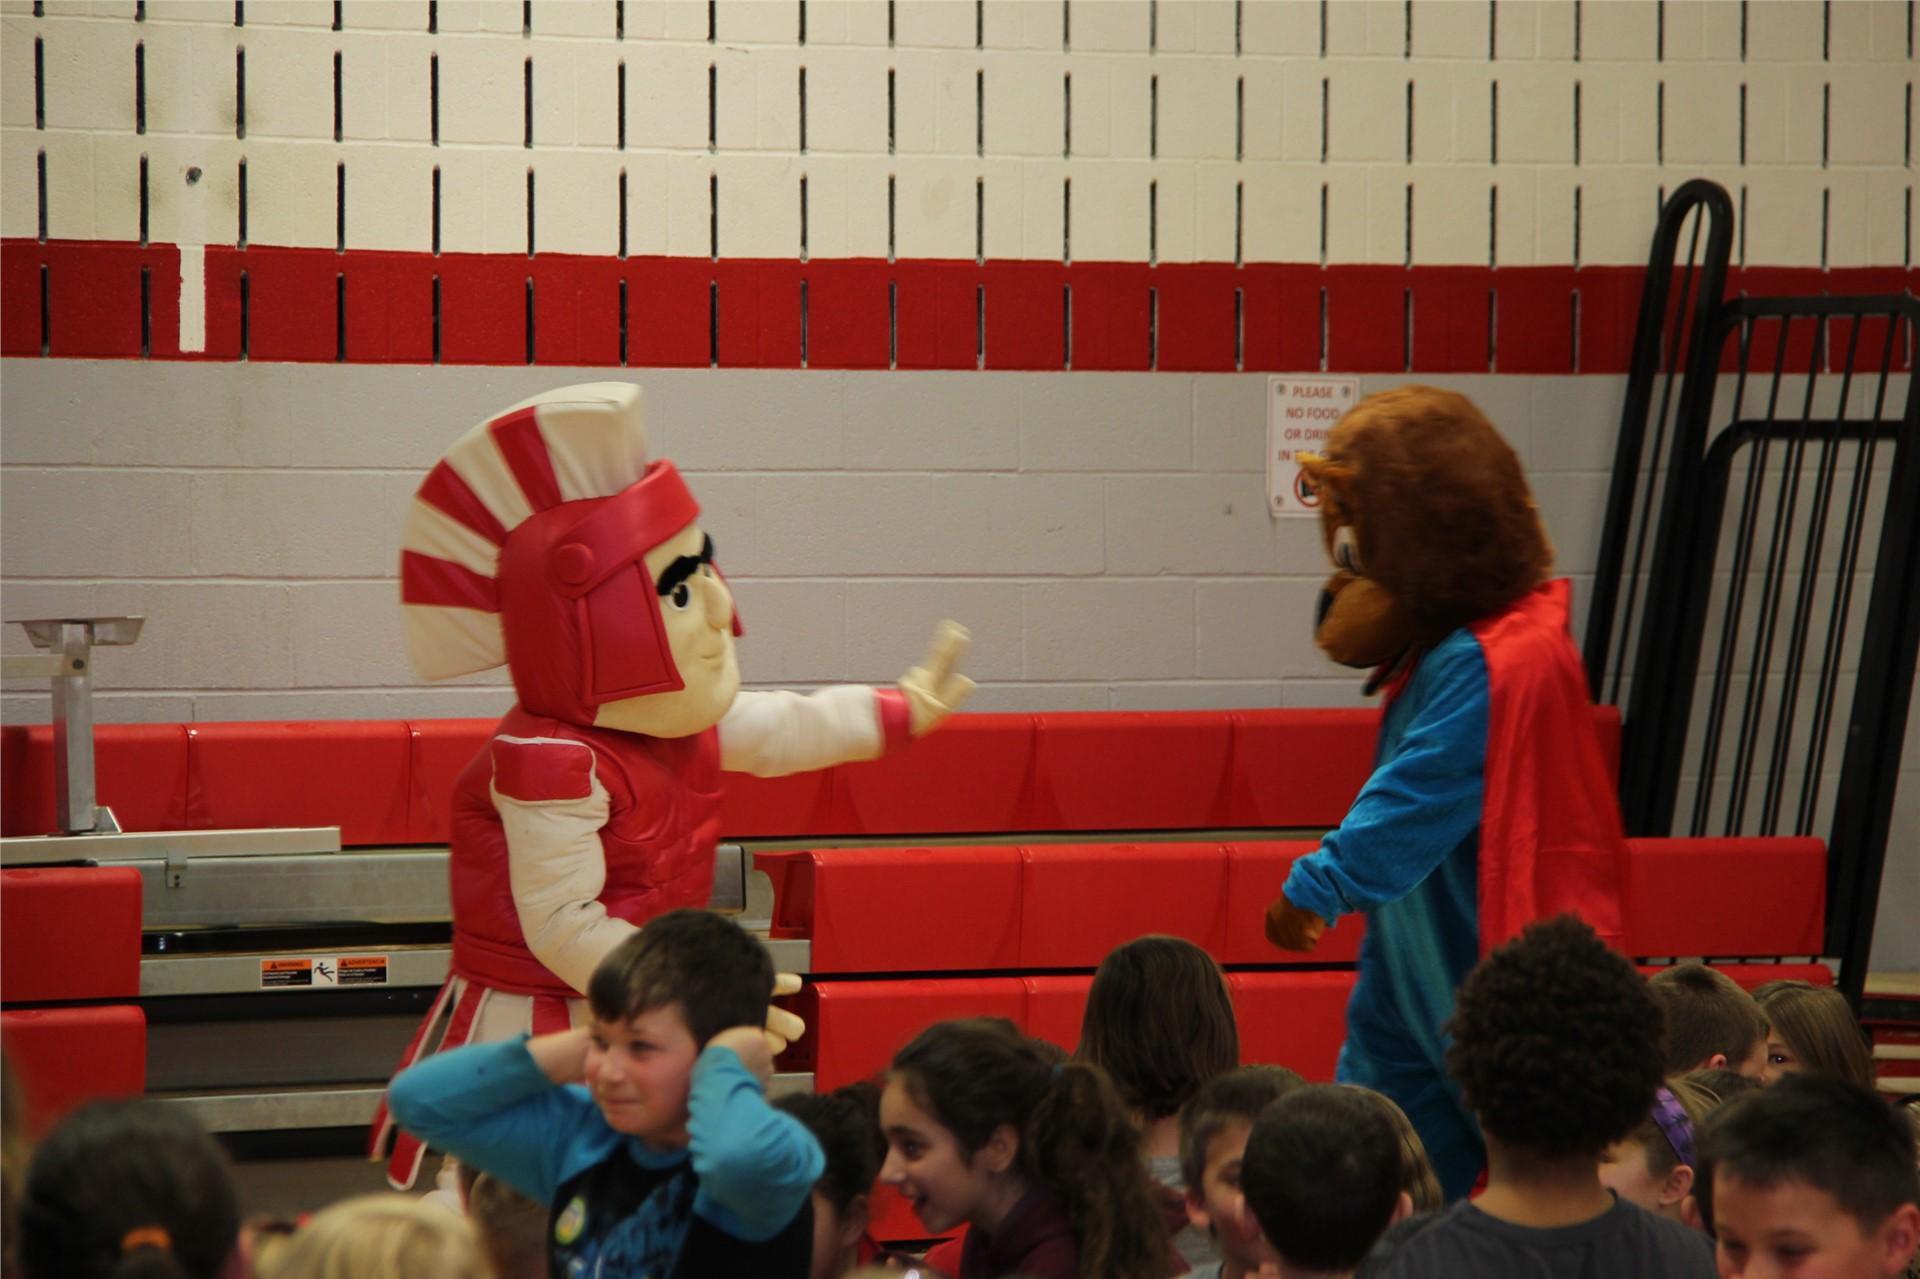 warrior mascot and bear mascot interact